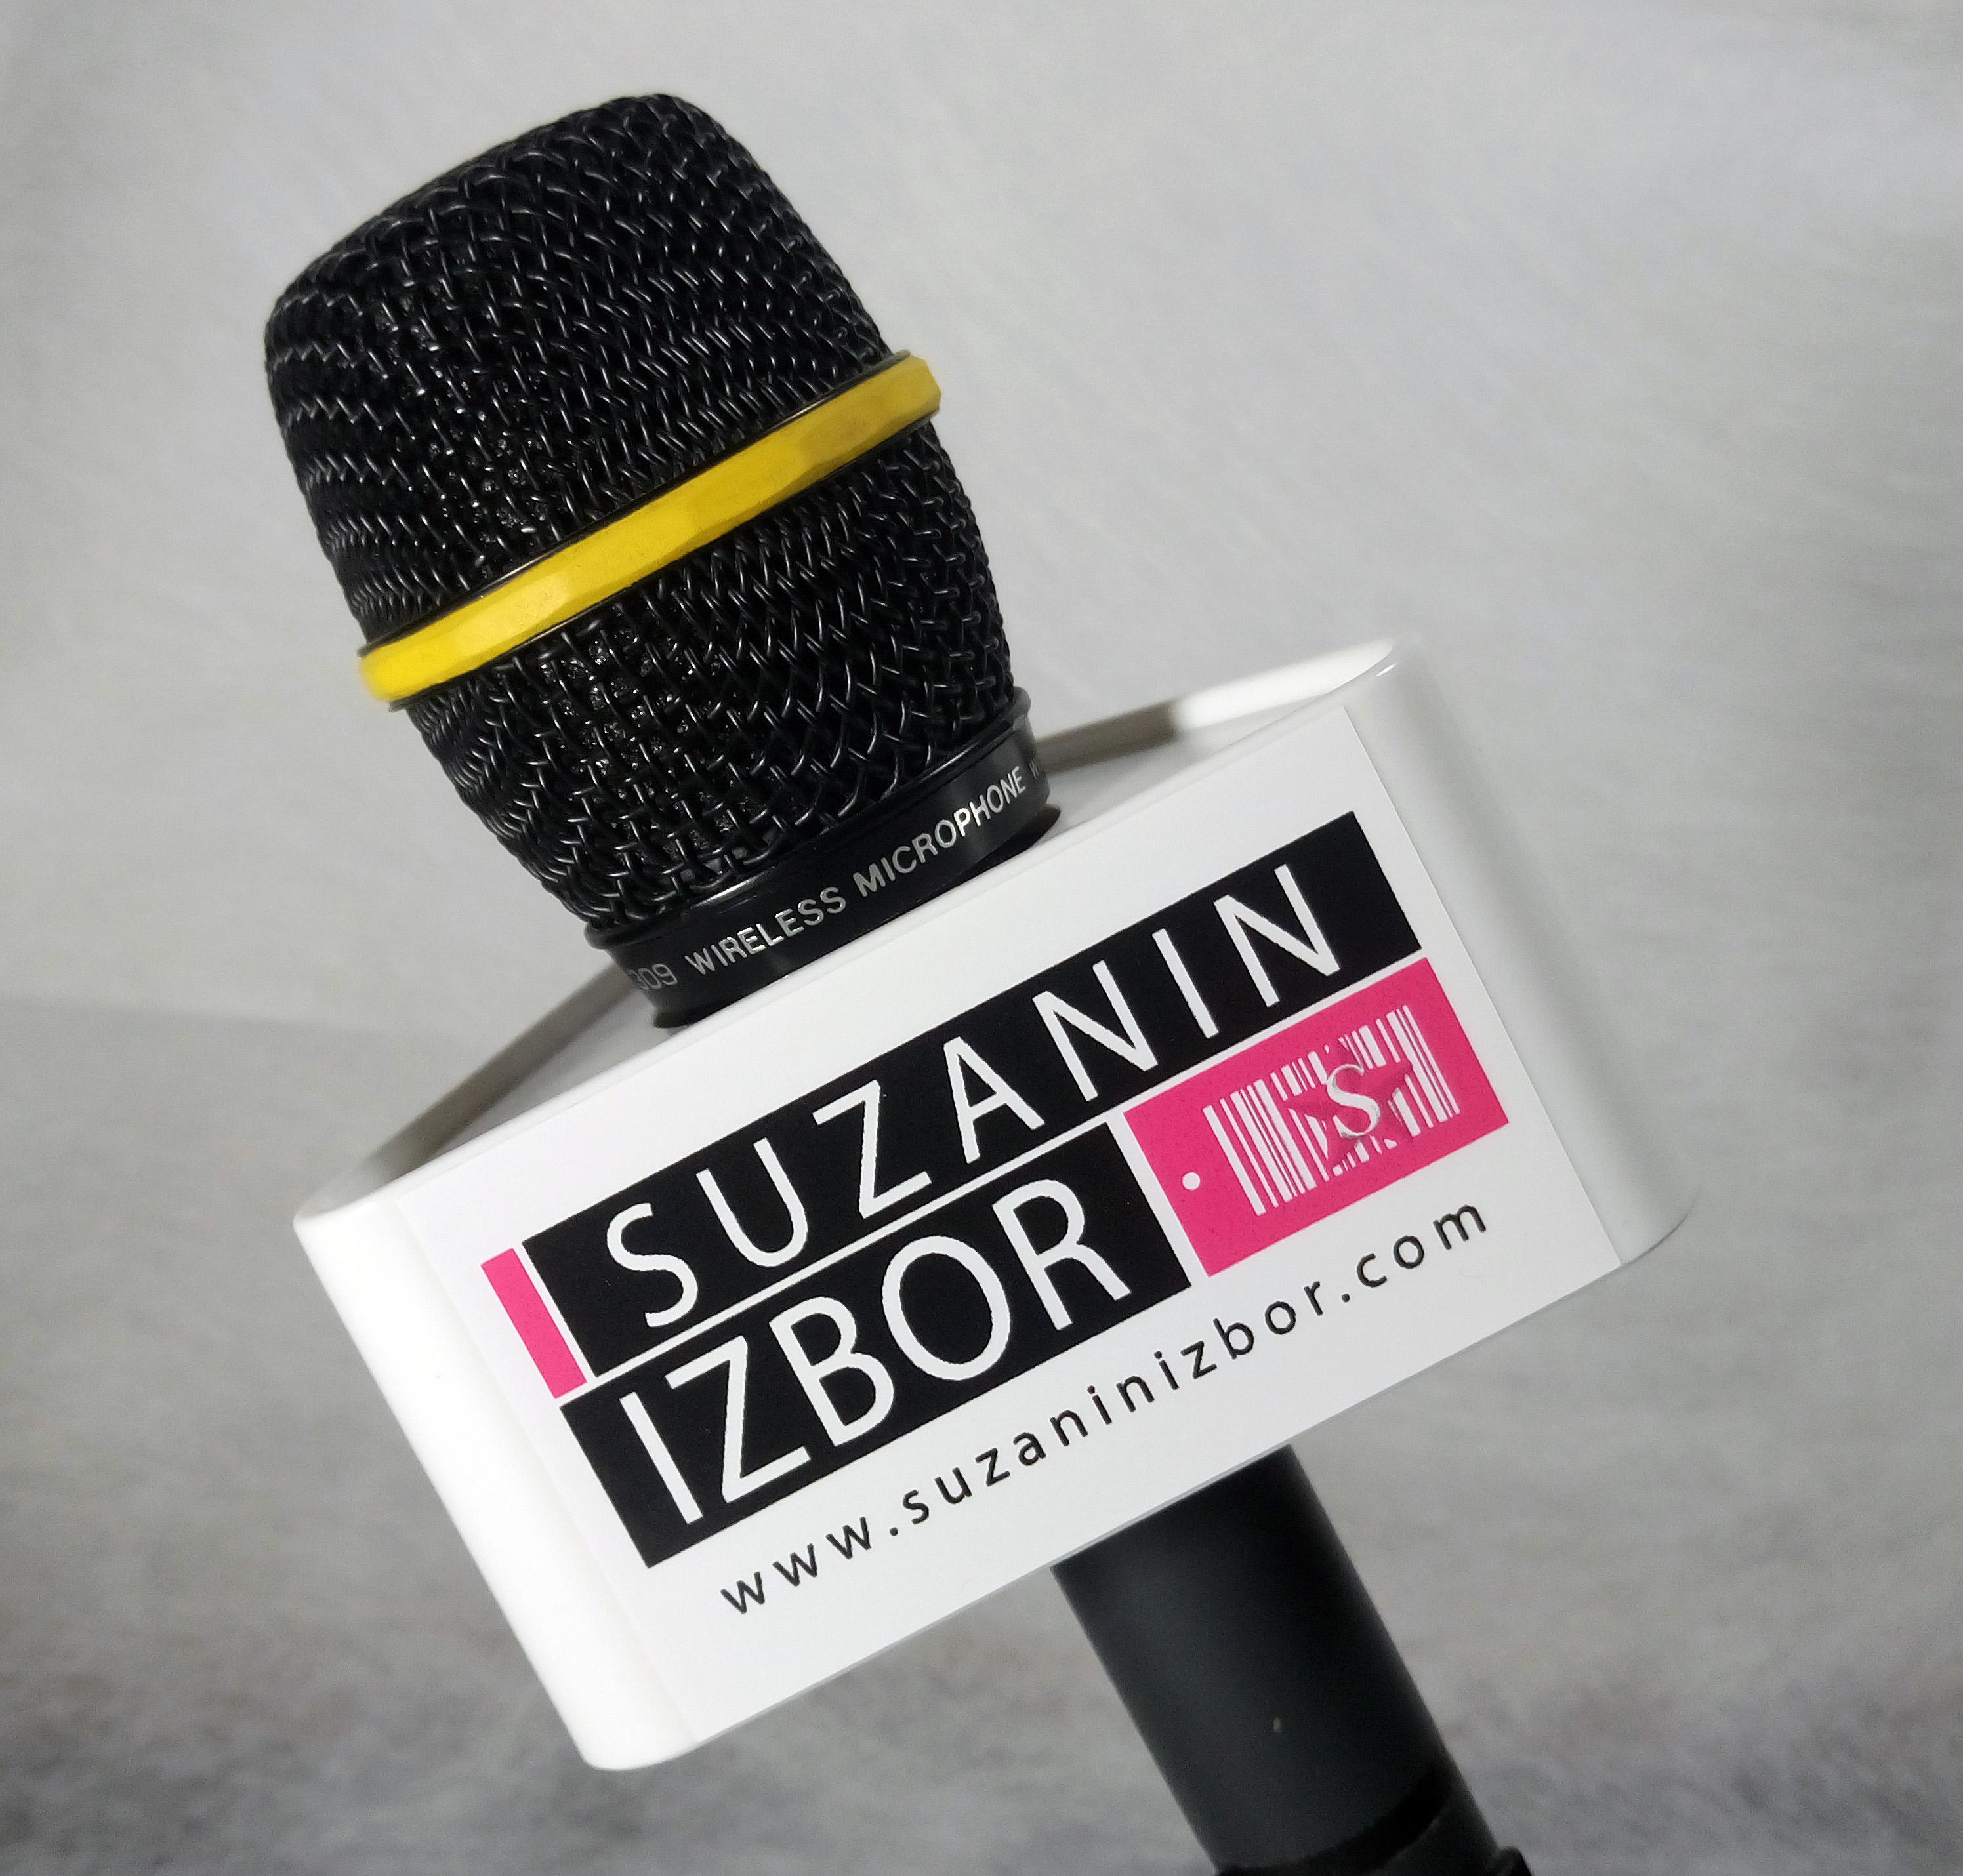 Suzanin izbor mic triangle 3